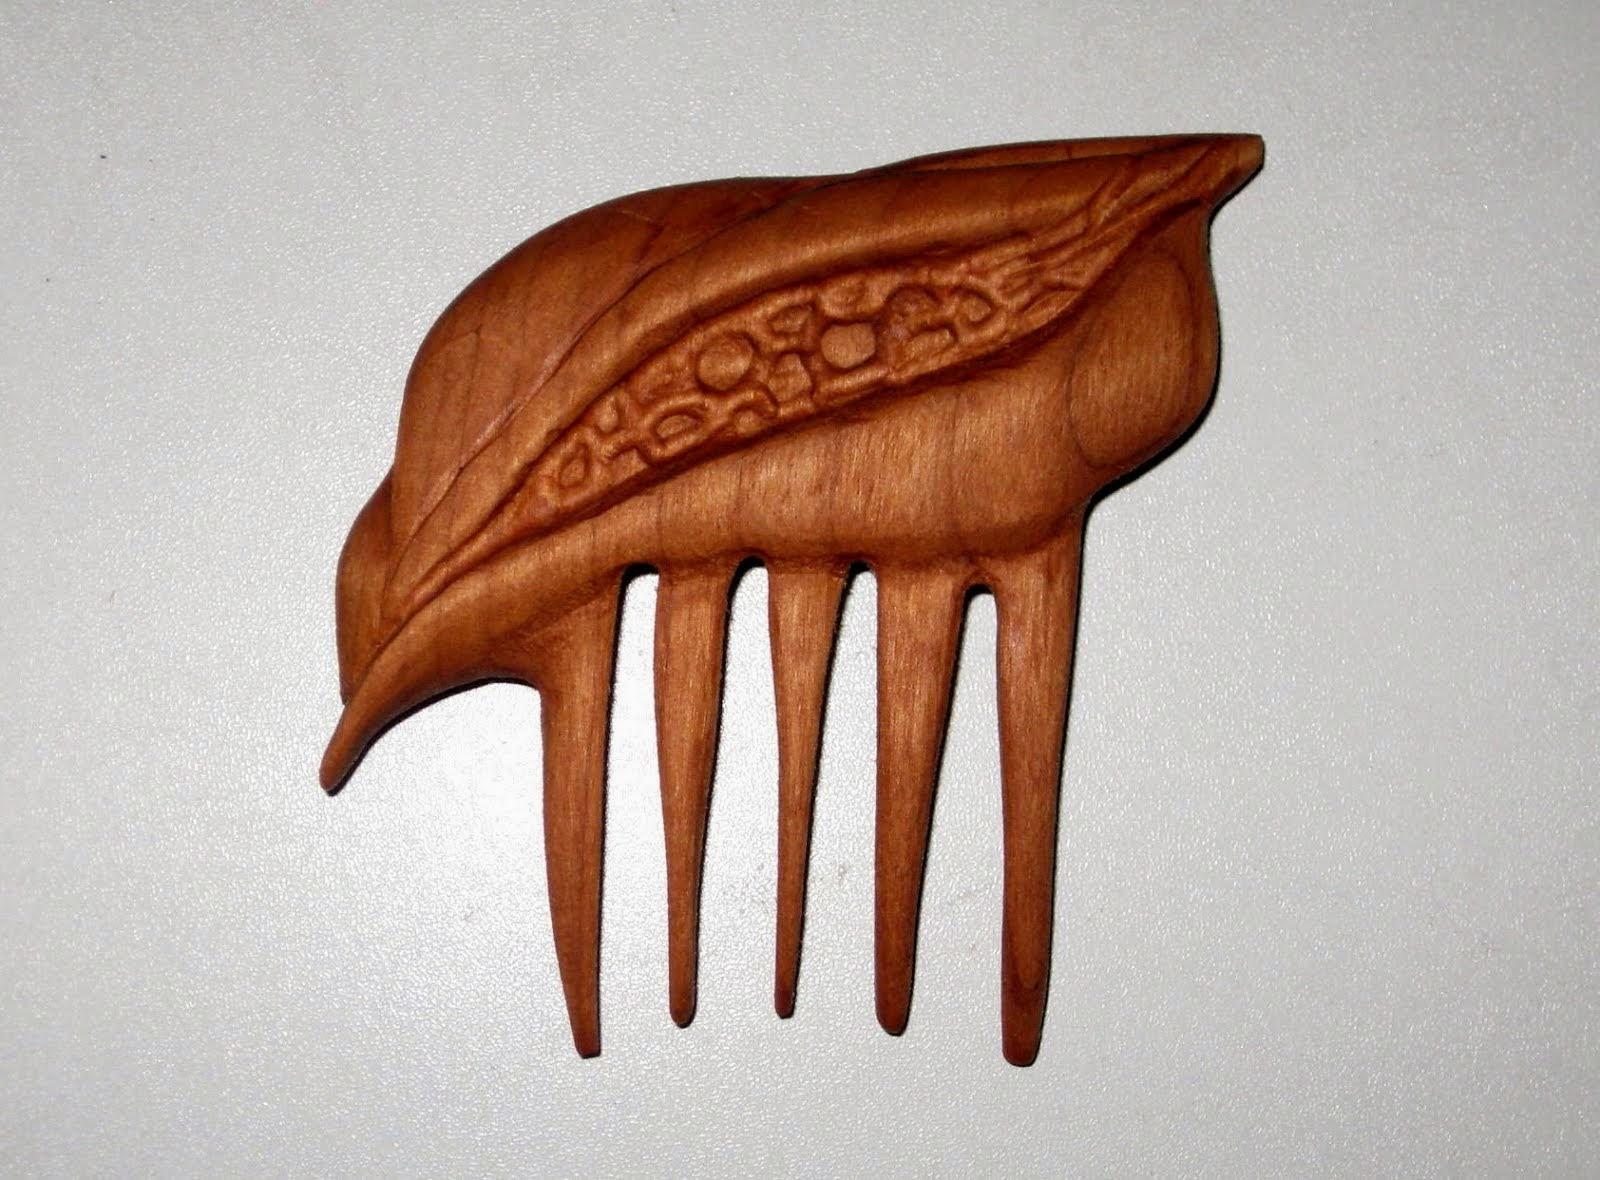 Corn Maiden Comb